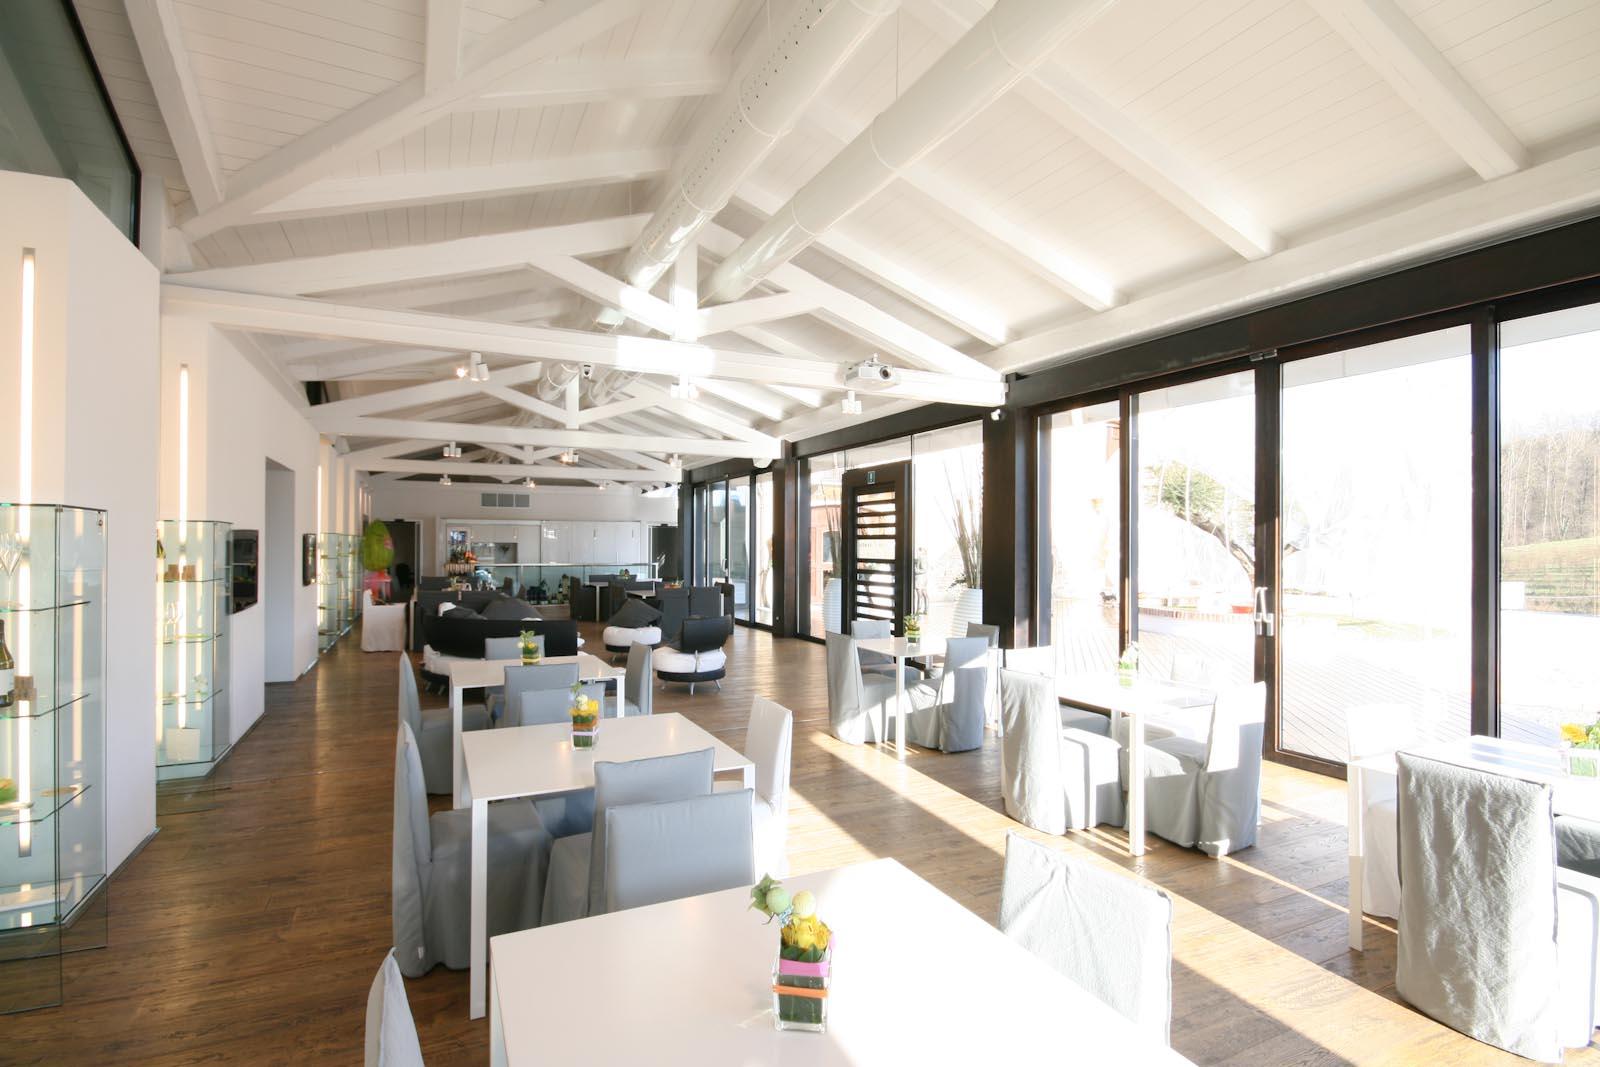 L'azienda vinicola moderna in vendita in zona Roero DOCG e Alta Langa DOCG